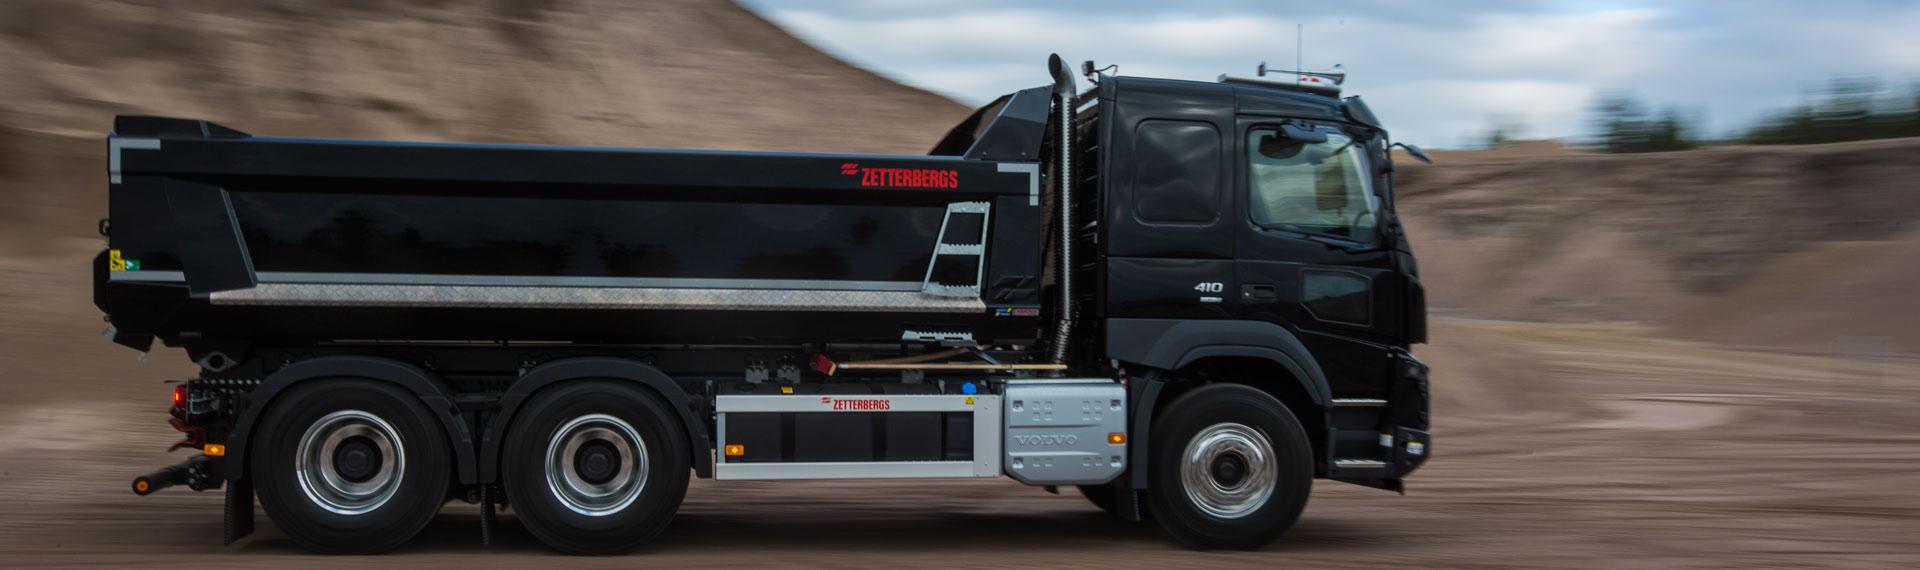 Volquete en Hardox® 500 Tuf con diseño de paneles laterales cónicos